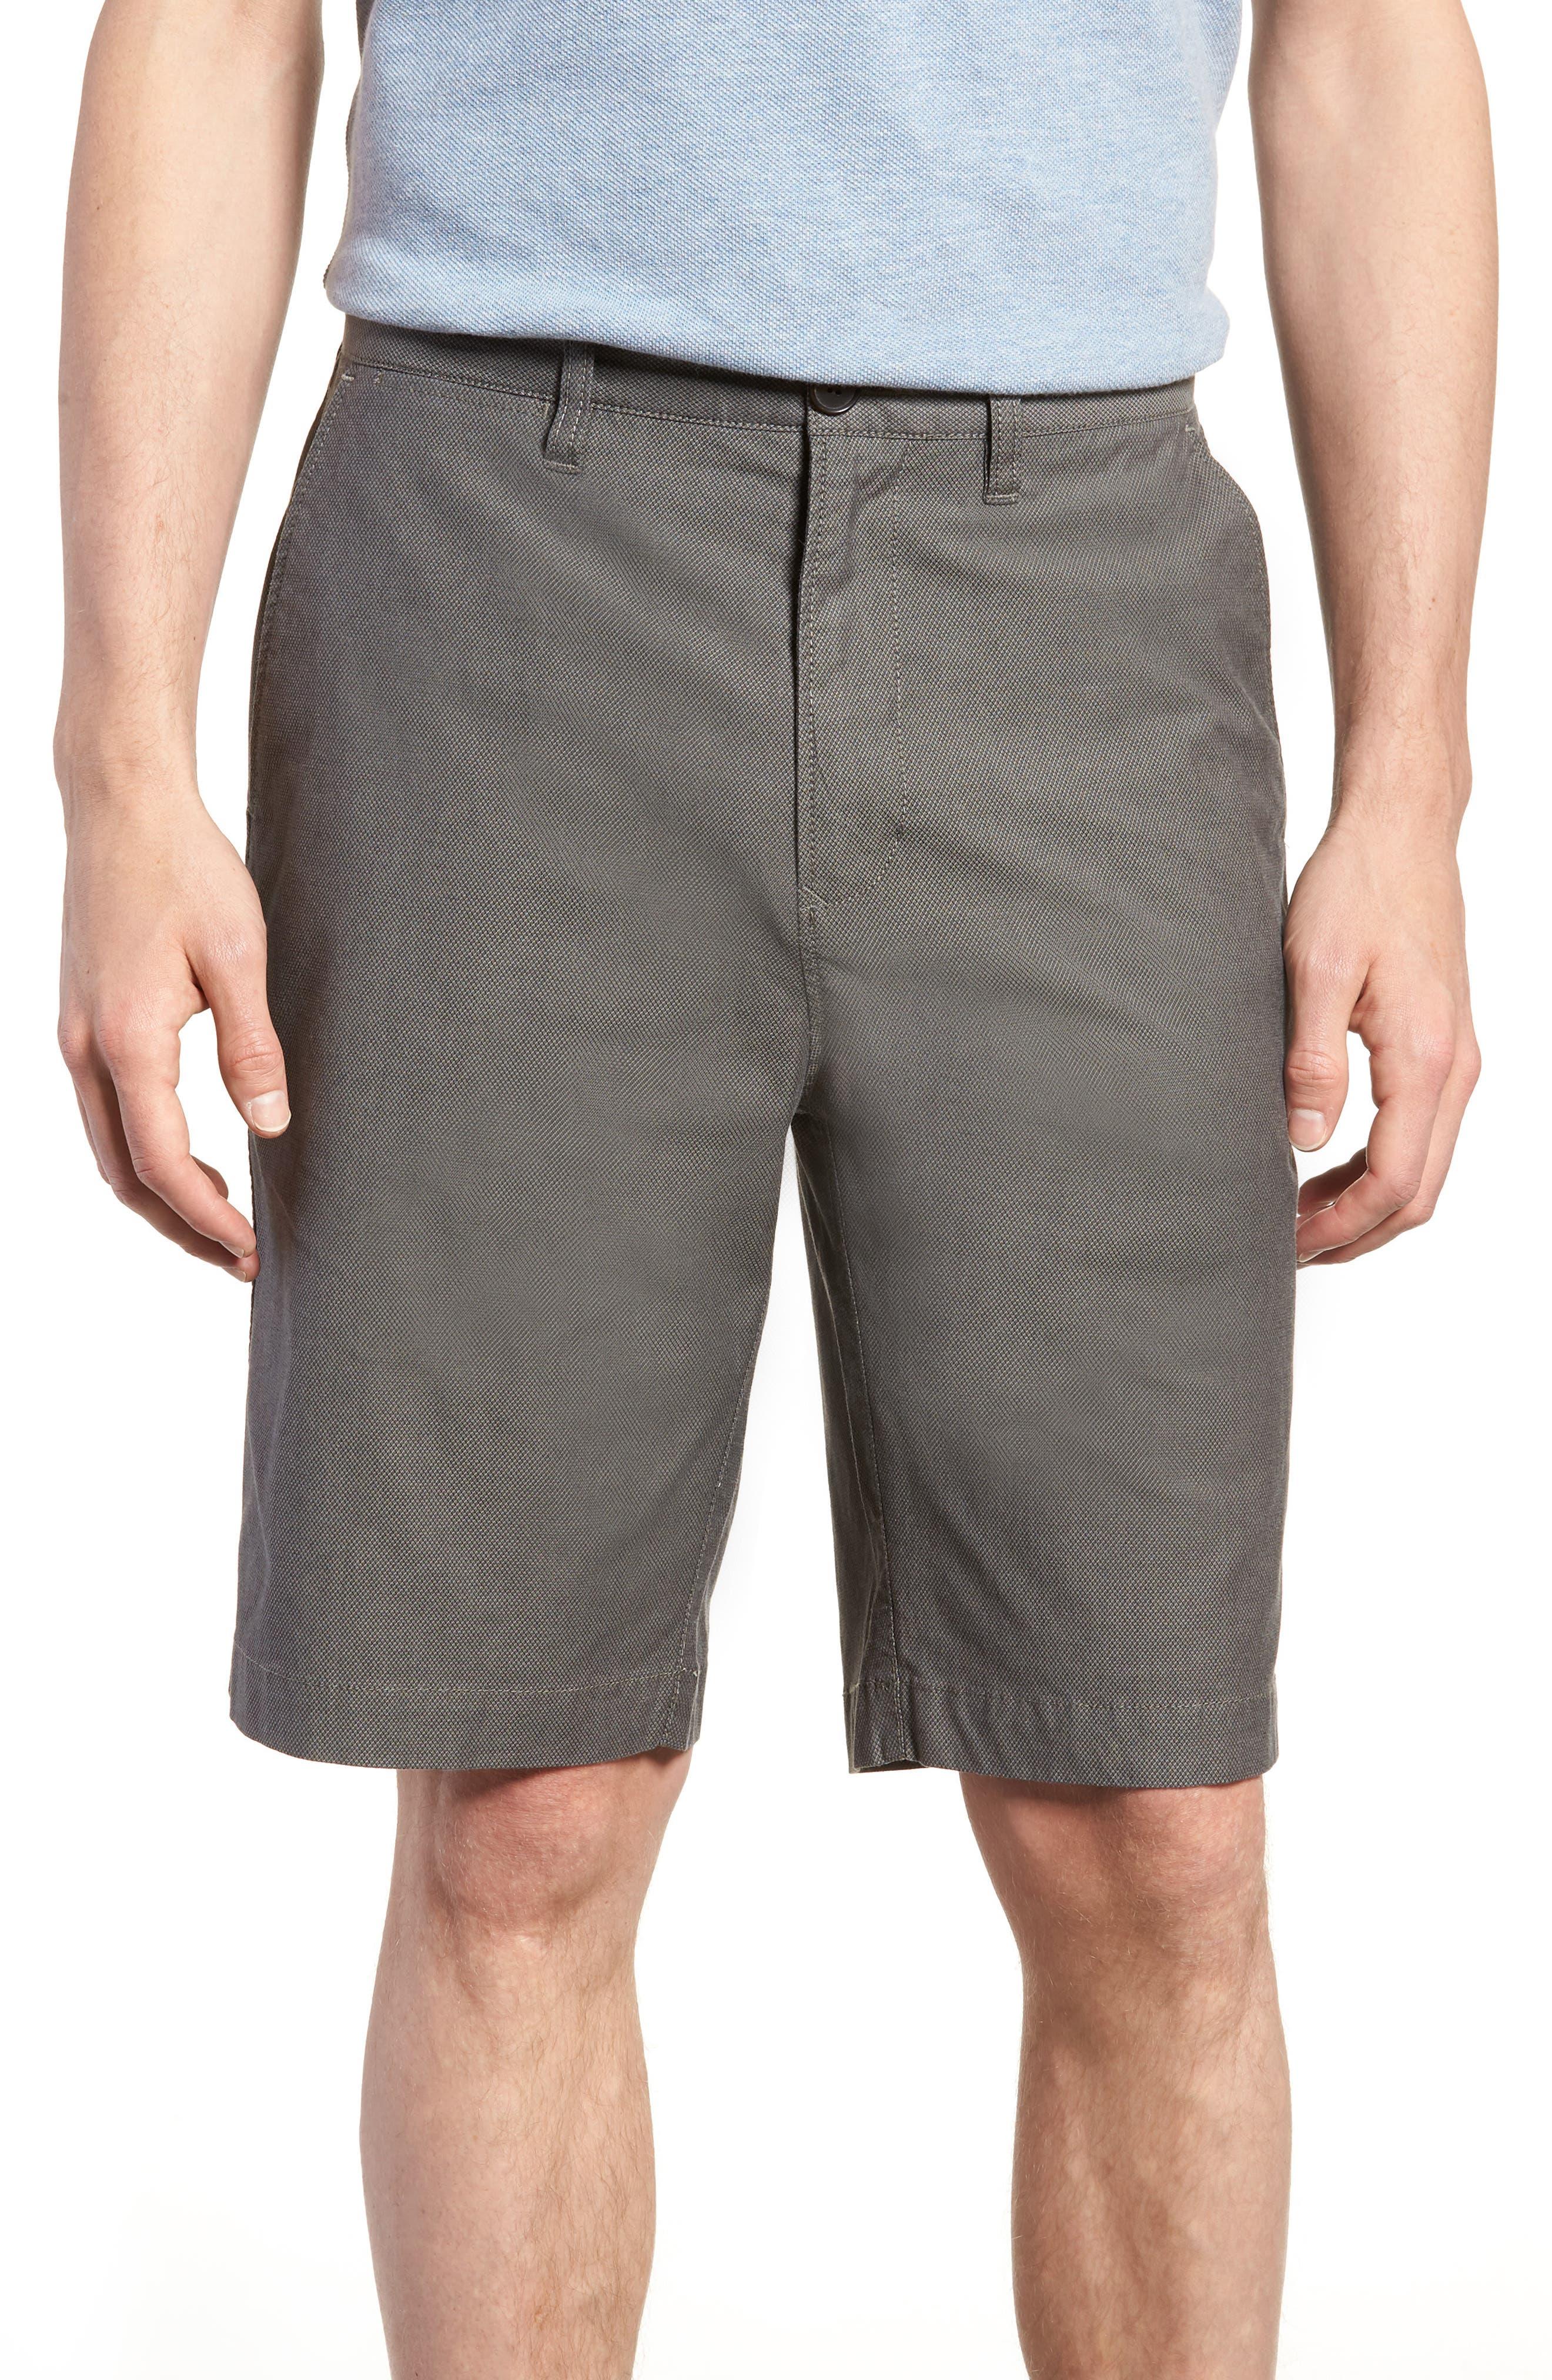 RODD & GUNN Army Bay Regular Fit Shorts, Main, color, 023